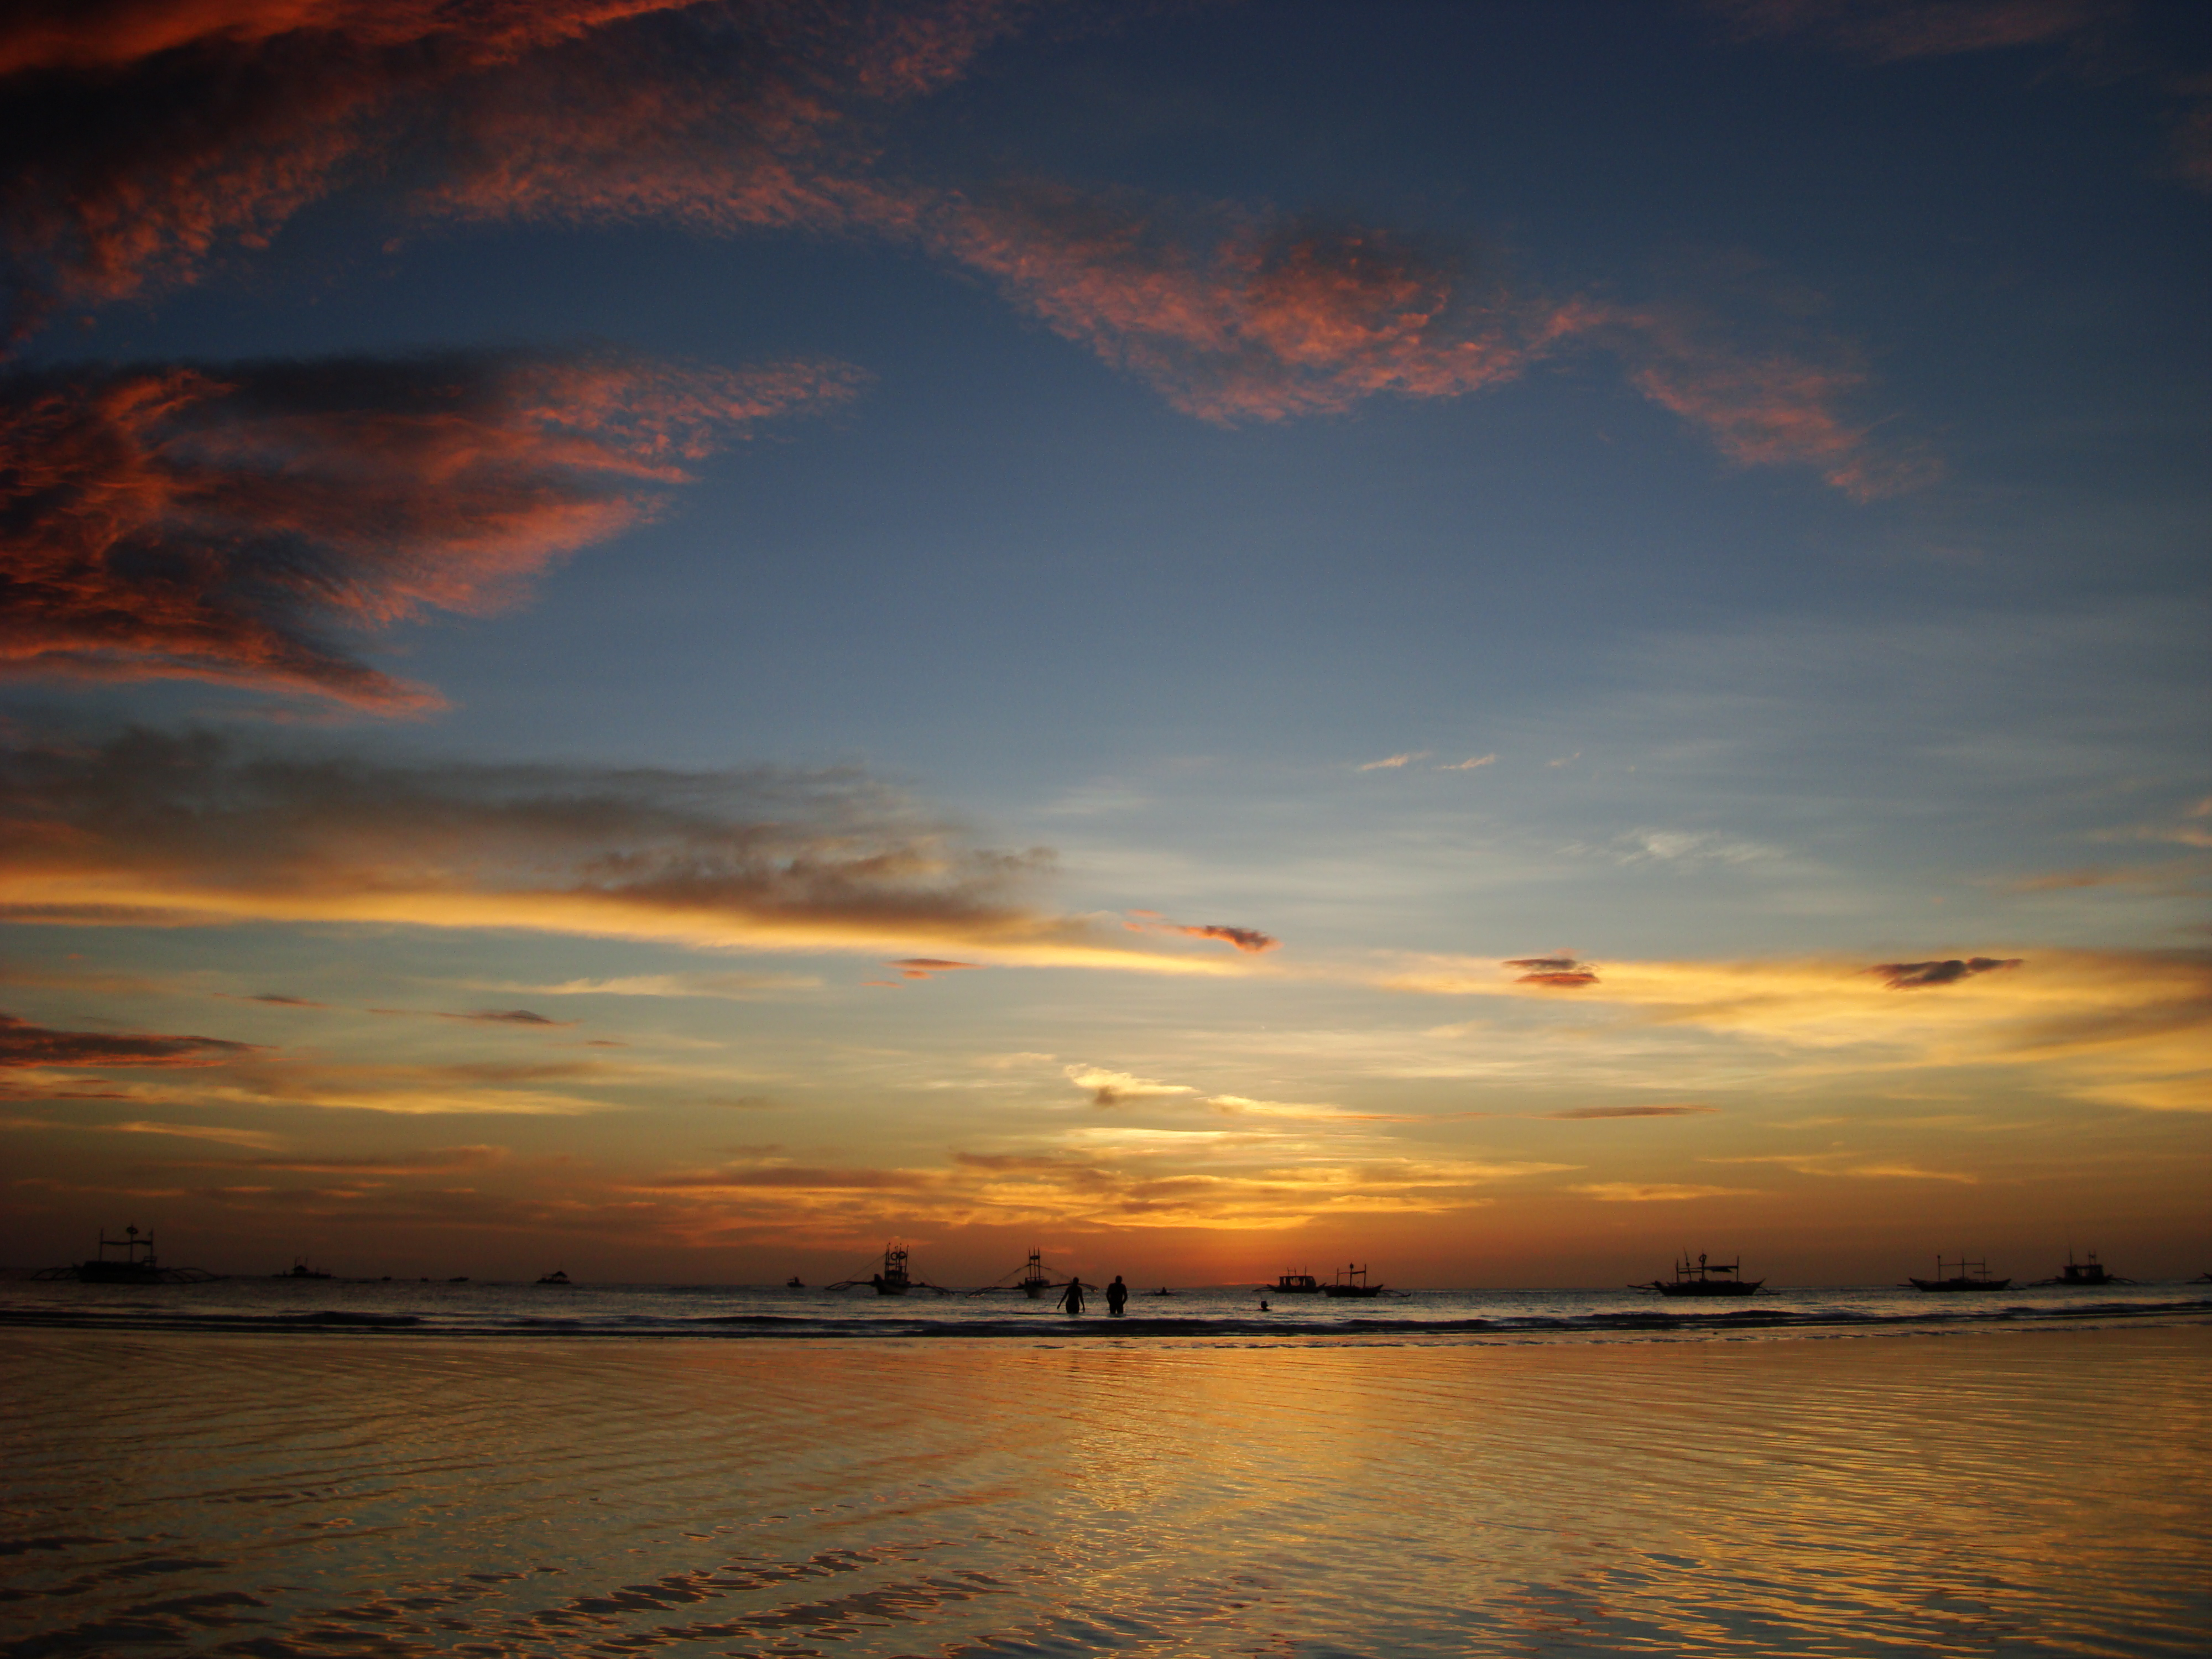 Sunset Philippines Boracay Beach 09